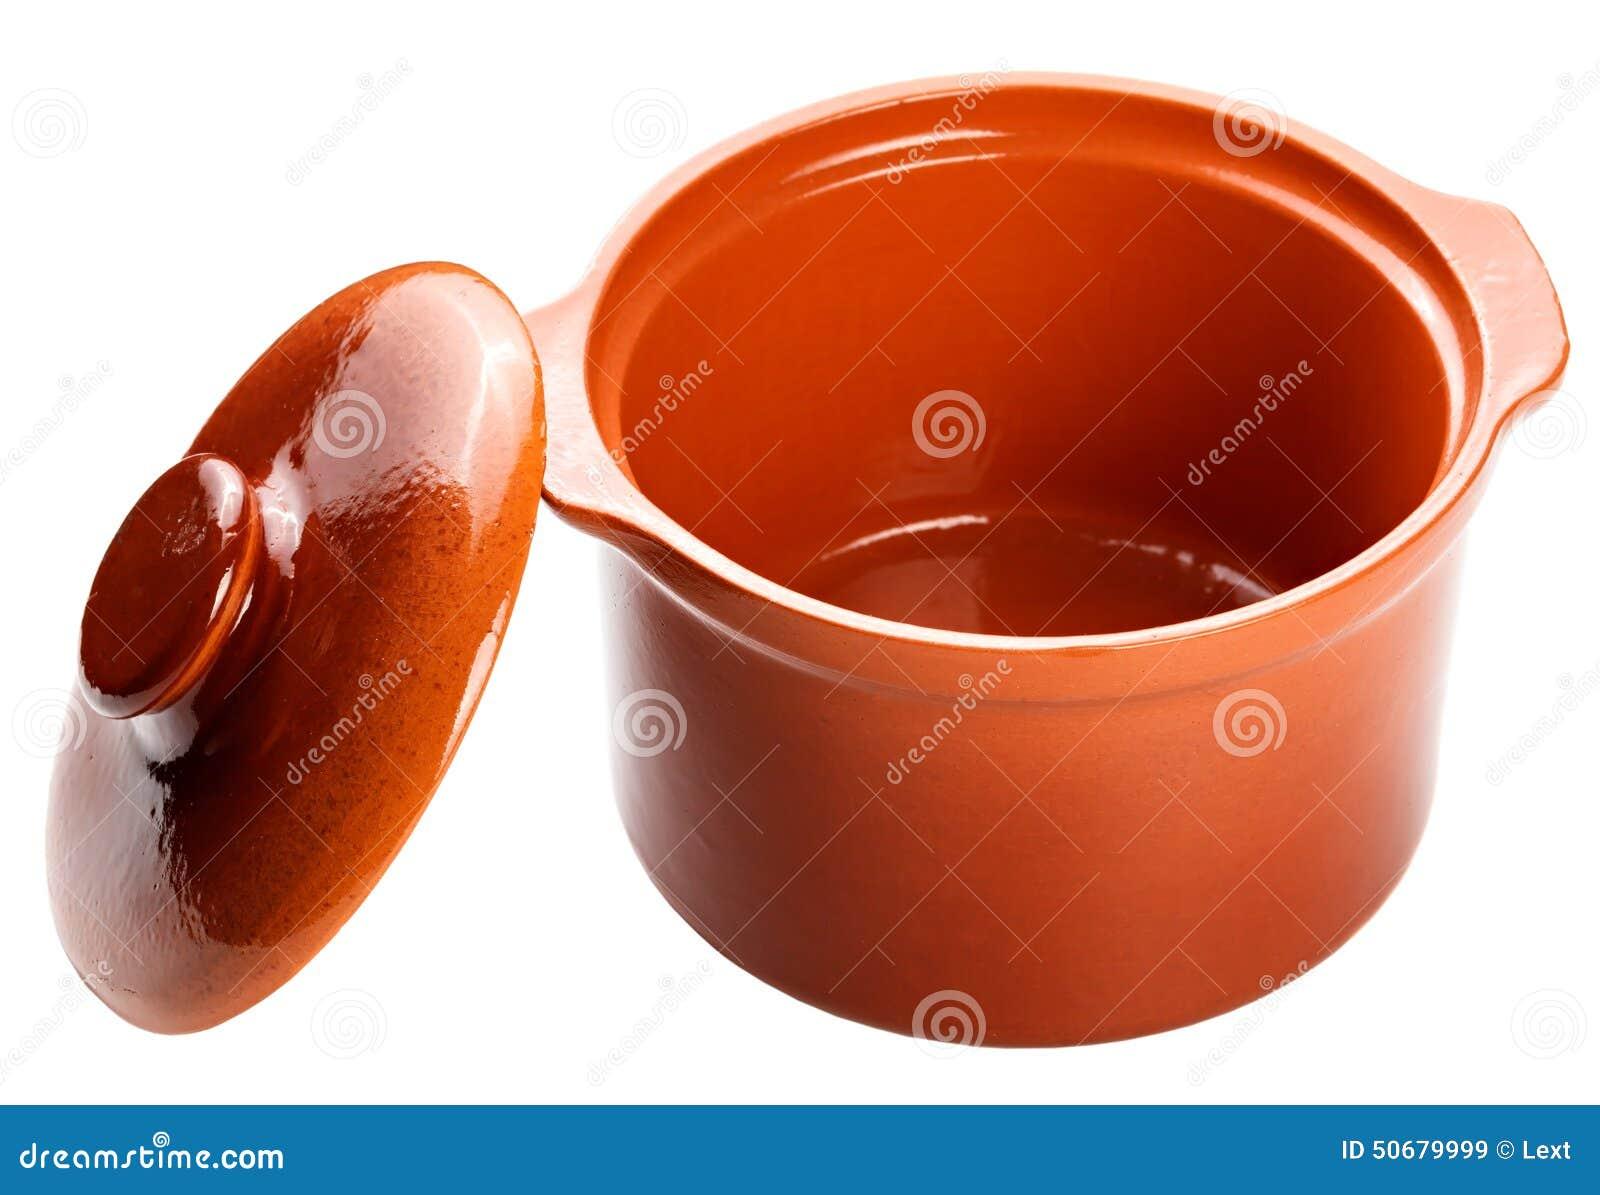 Download 烹调的泥罐 库存图片. 图片 包括有 简单, 厨房, 碗筷, 空白, 手工制造, 烹调, 粗陶器, browne - 50679999